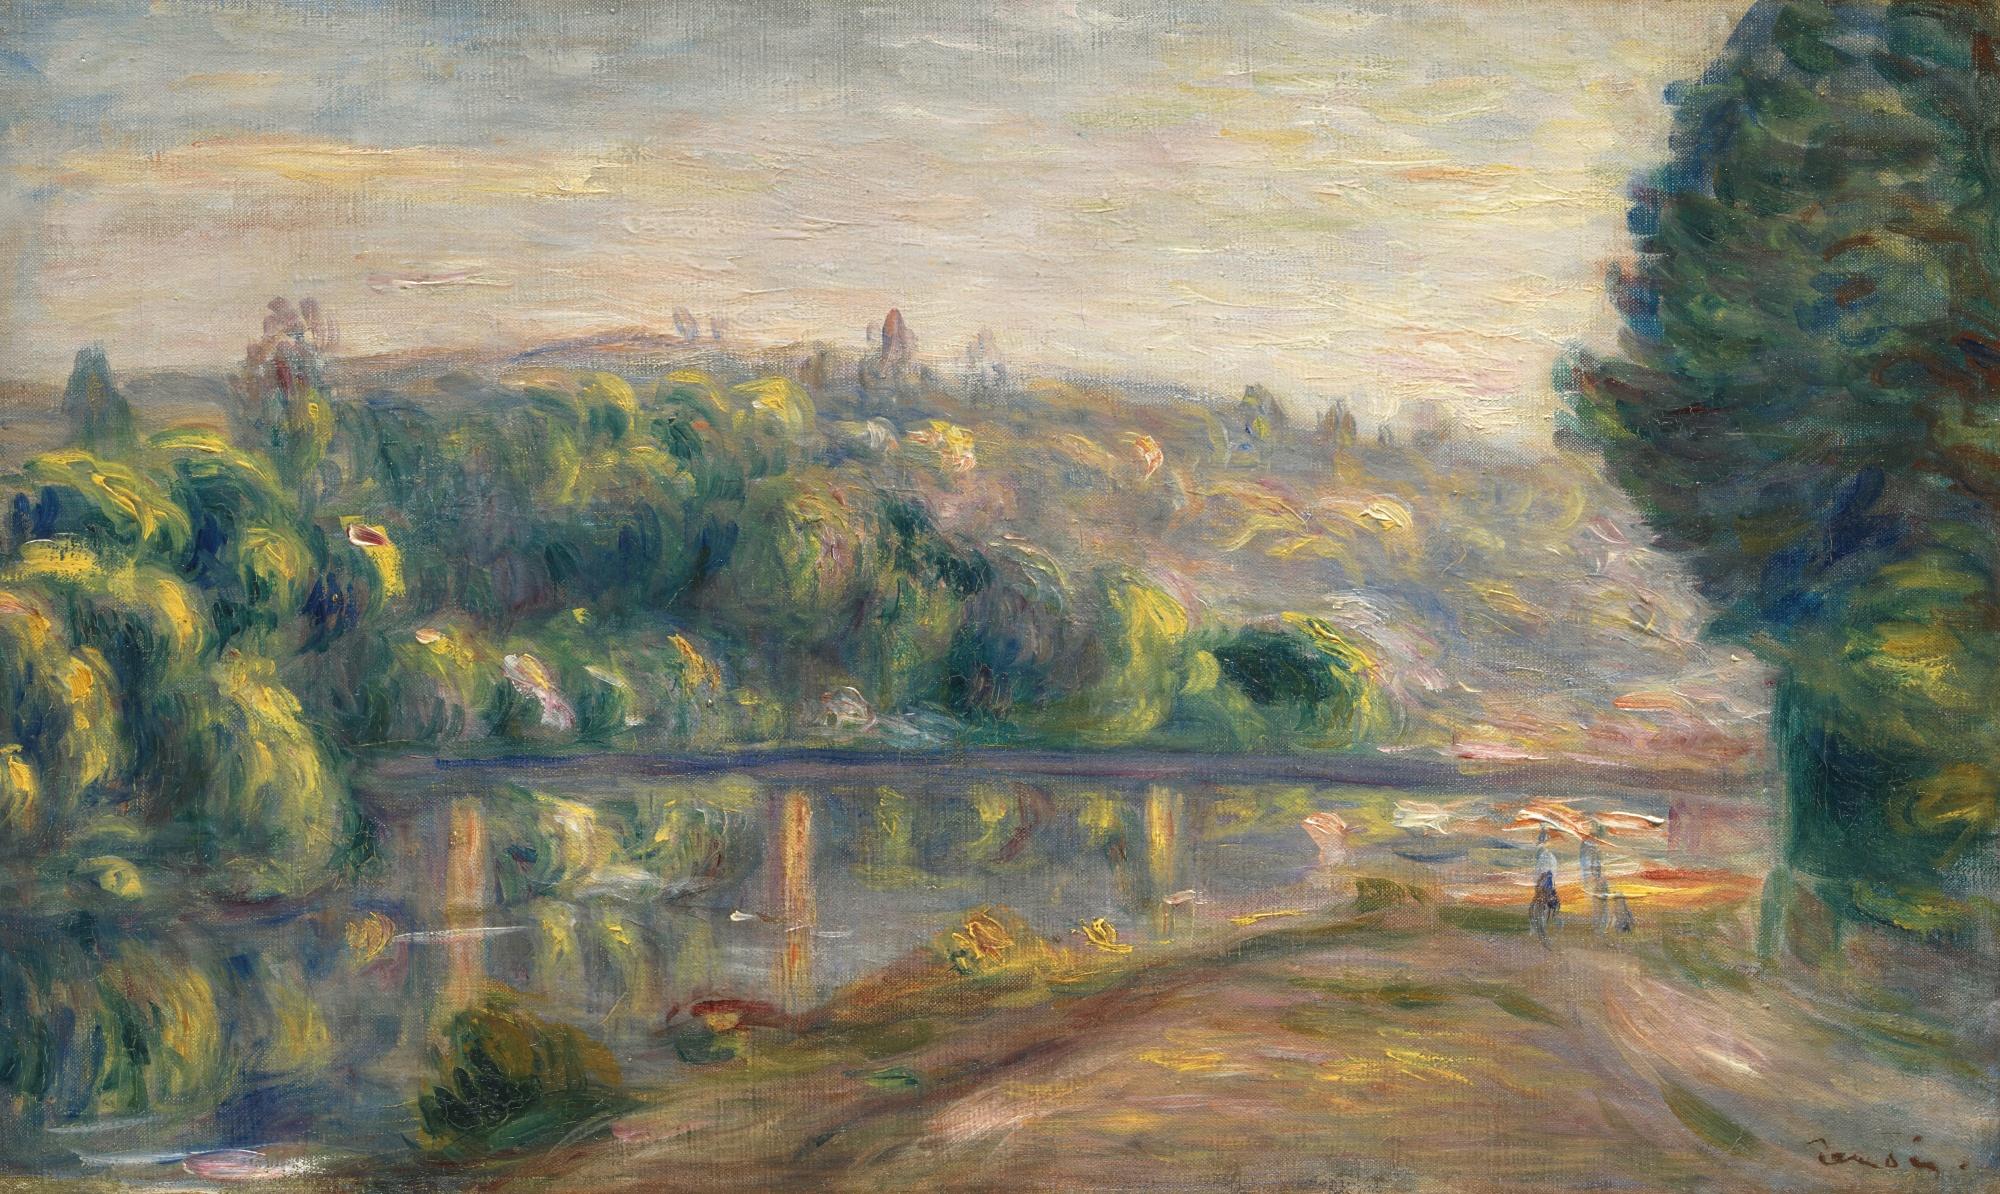 Fall In New York Wallpaper Pierre Auguste Renoir Le Bras Vif A Choissy 600 800k 1